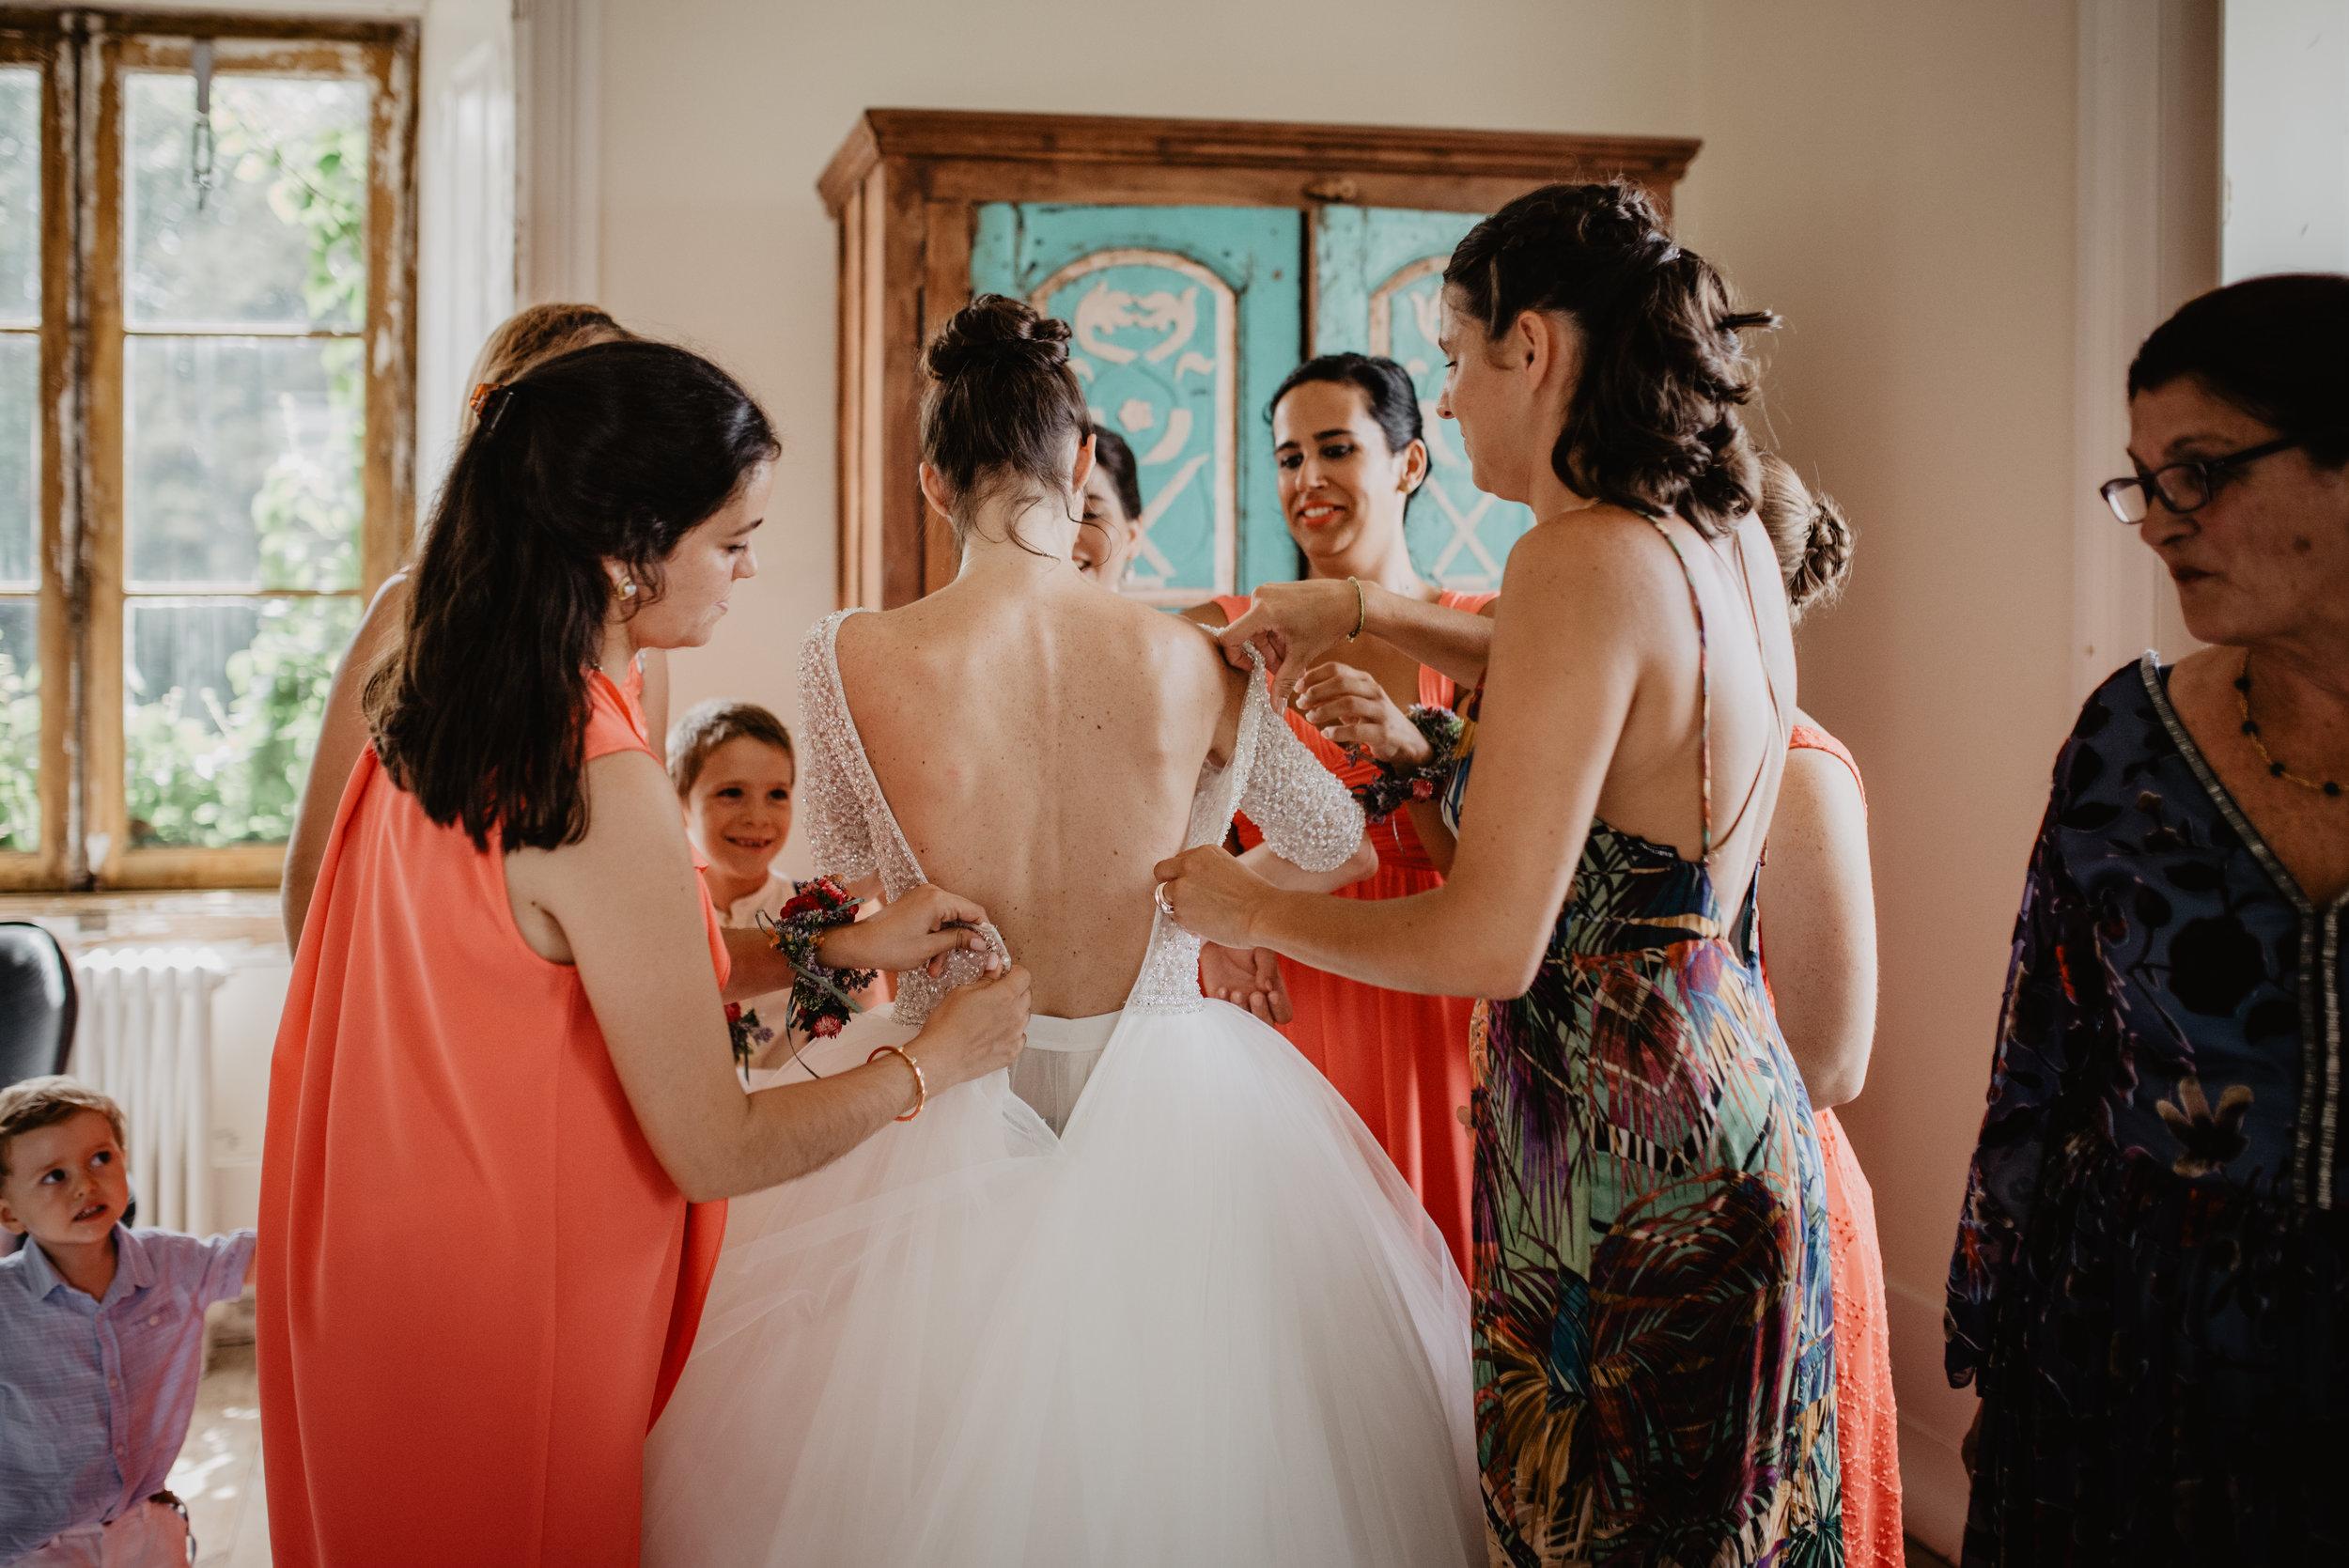 Lapela-photography-wedding-sintra-portugal-42.jpg